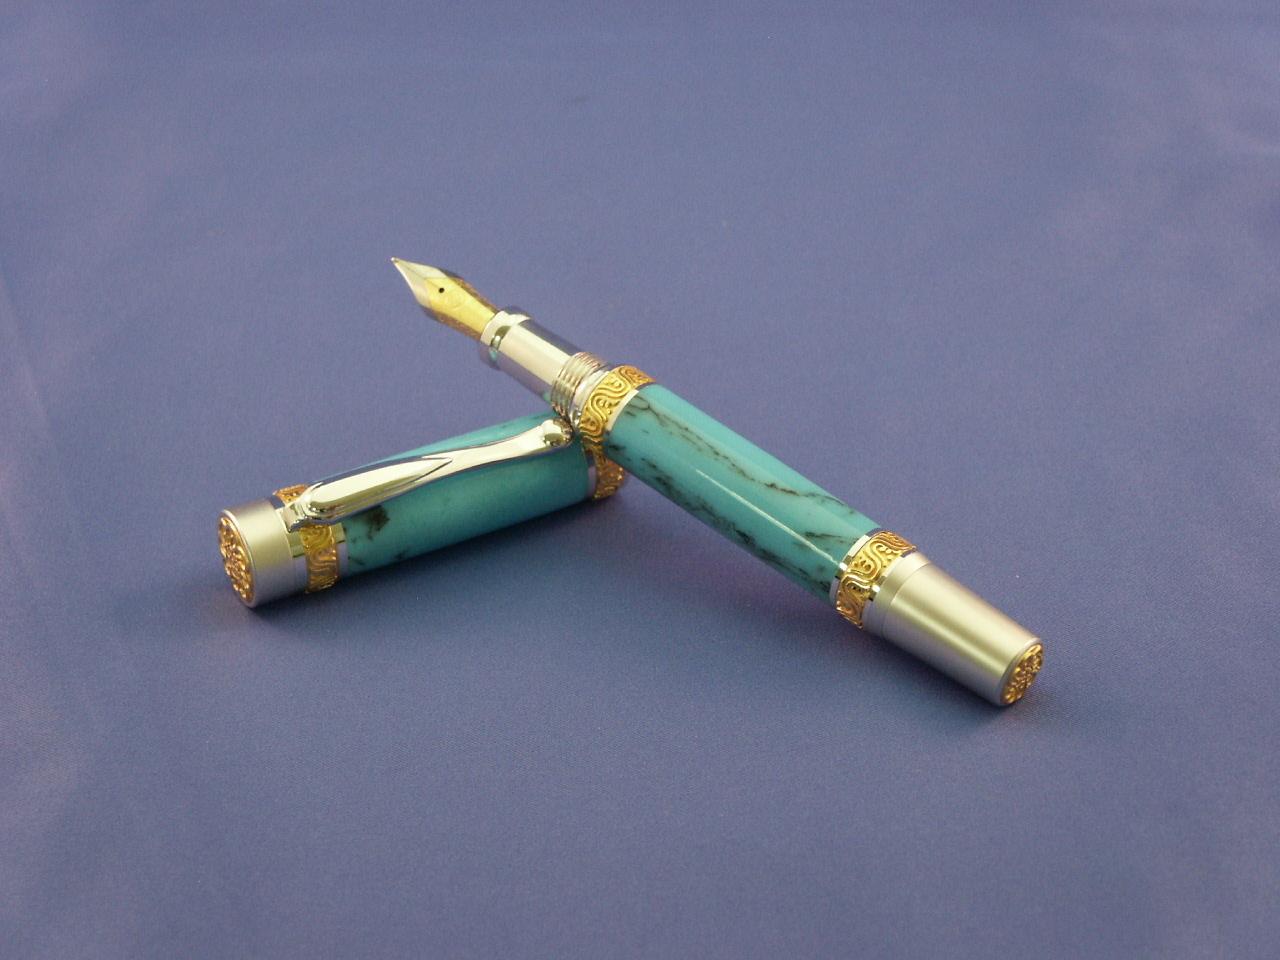 Turquoise Fountain Pen